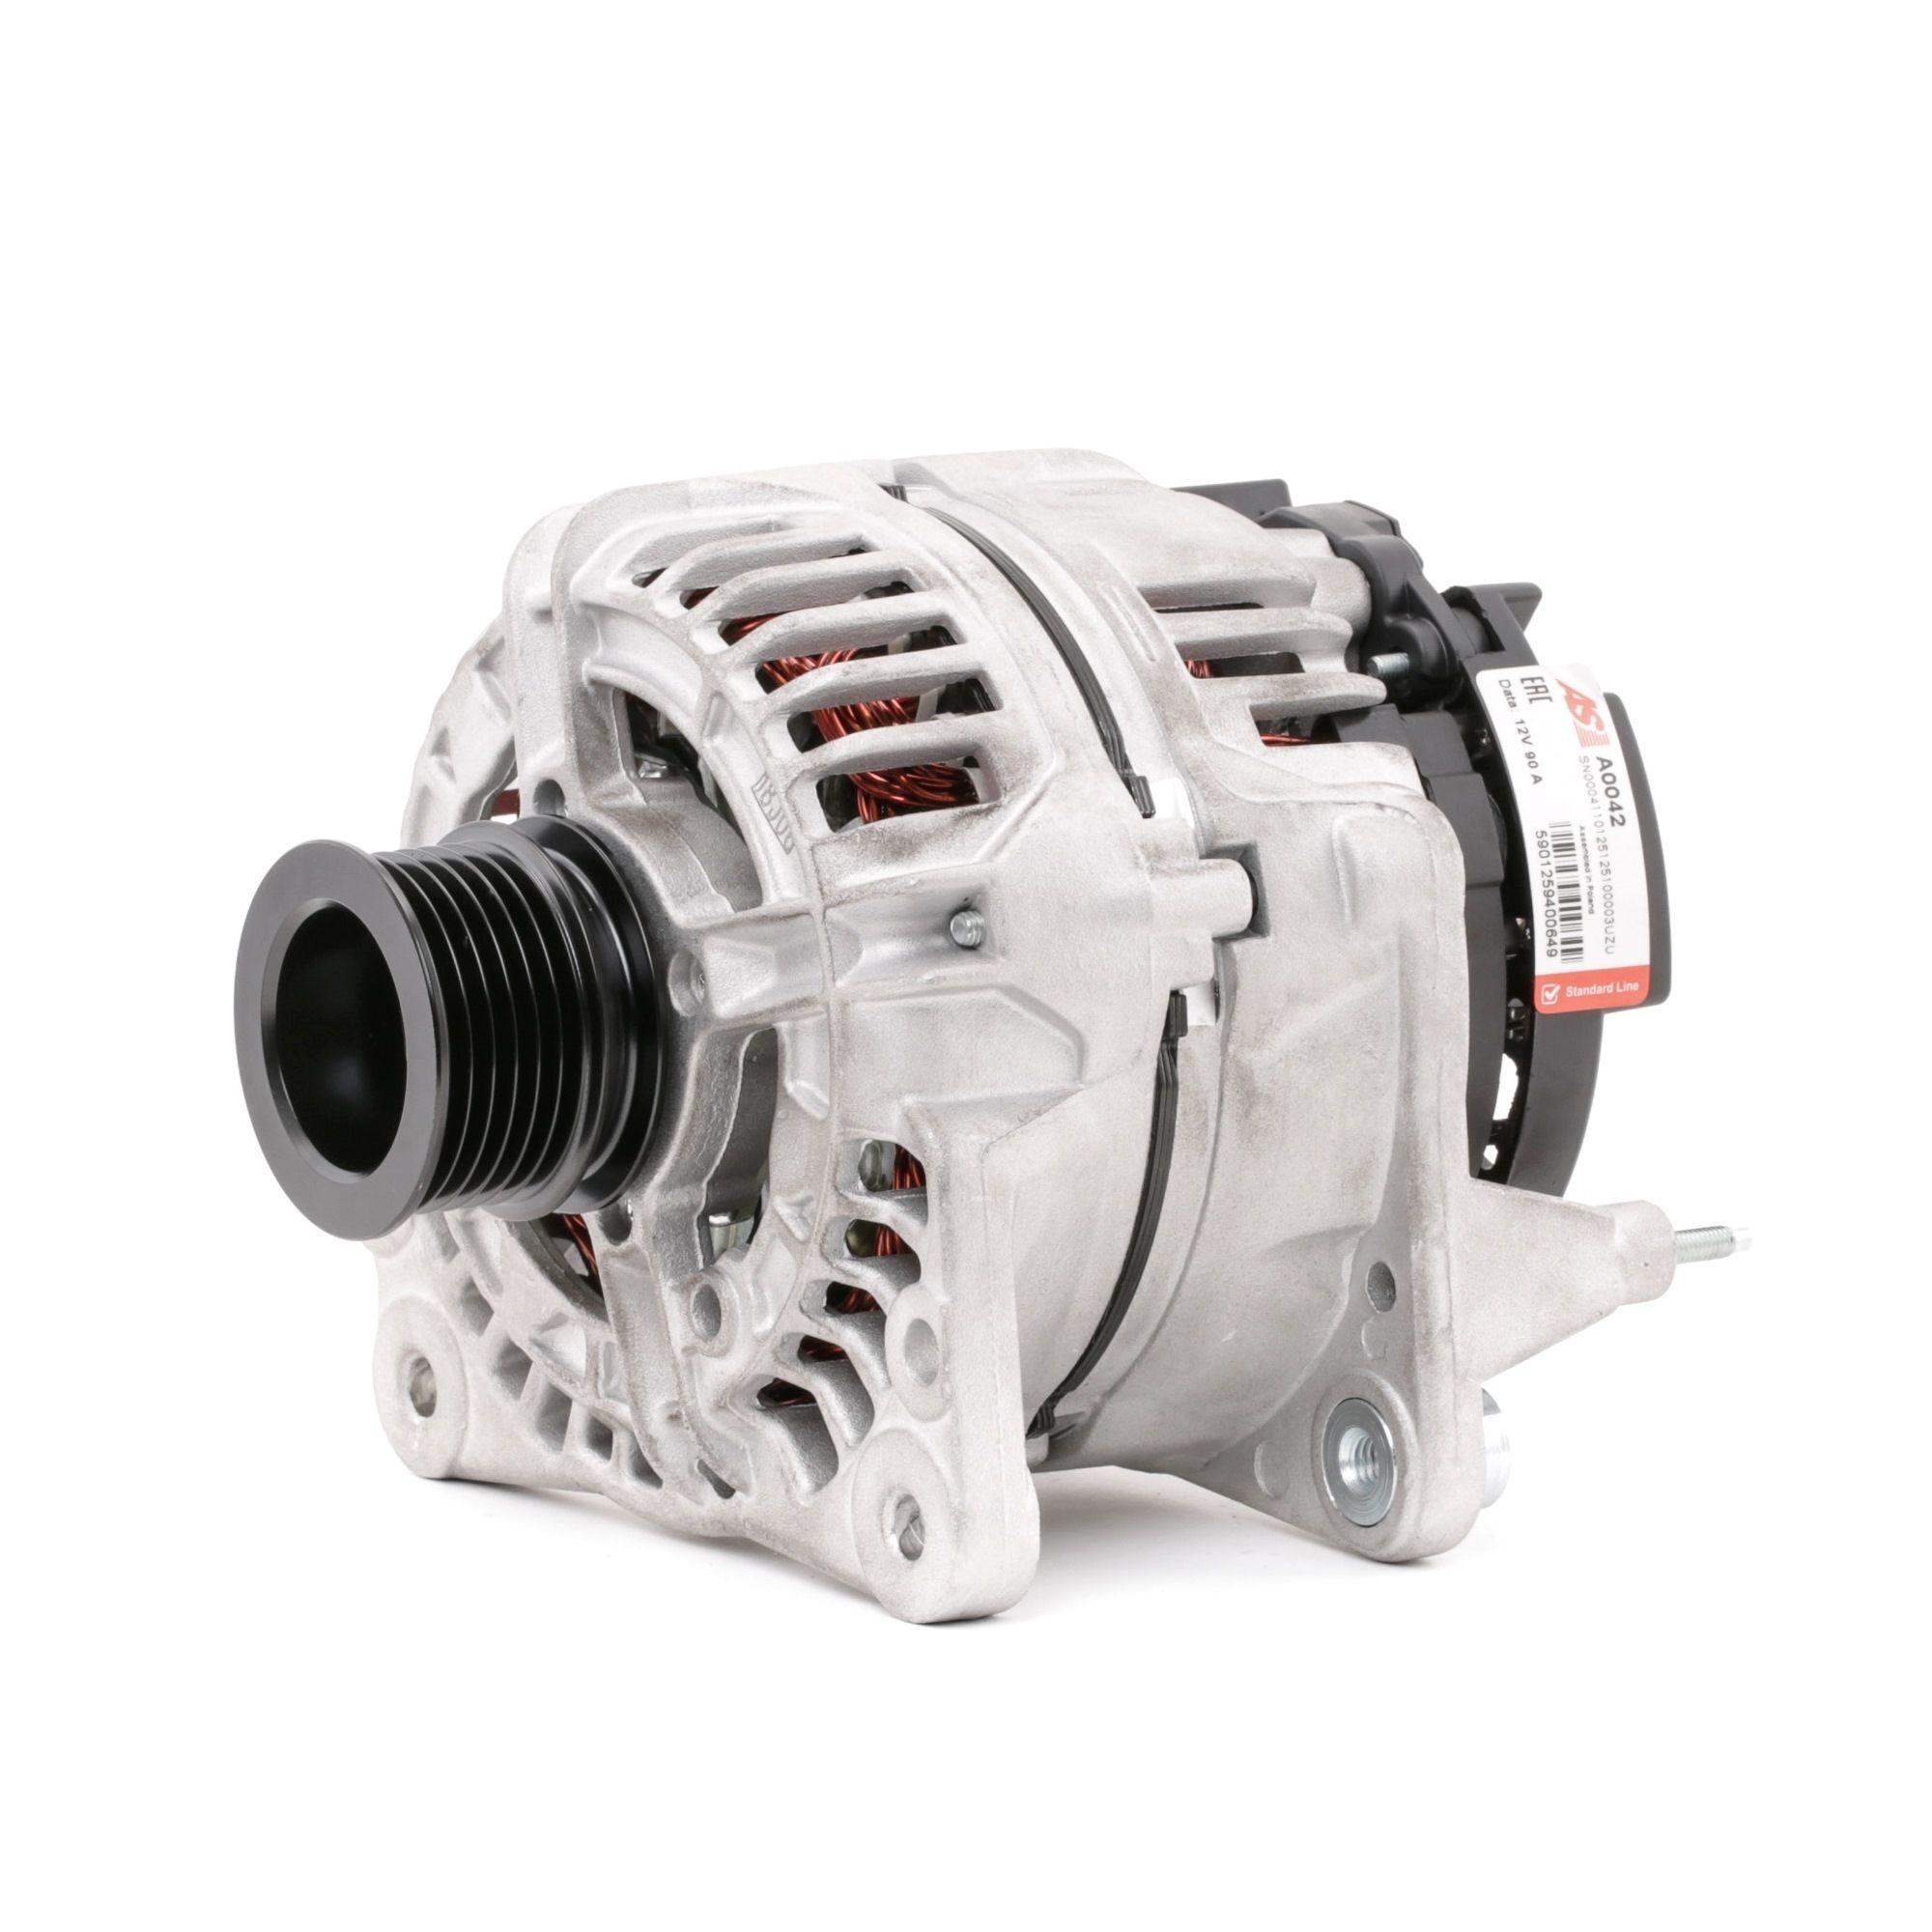 AS-PL Laturi Brand new AS-PL Alternator brush holder A0042 Generaattori VW,AUDI,OPEL,GOLF IV 1J1,POLO 9N_,PASSAT Variant 3C5,GOLF PLUS 5M1, 521